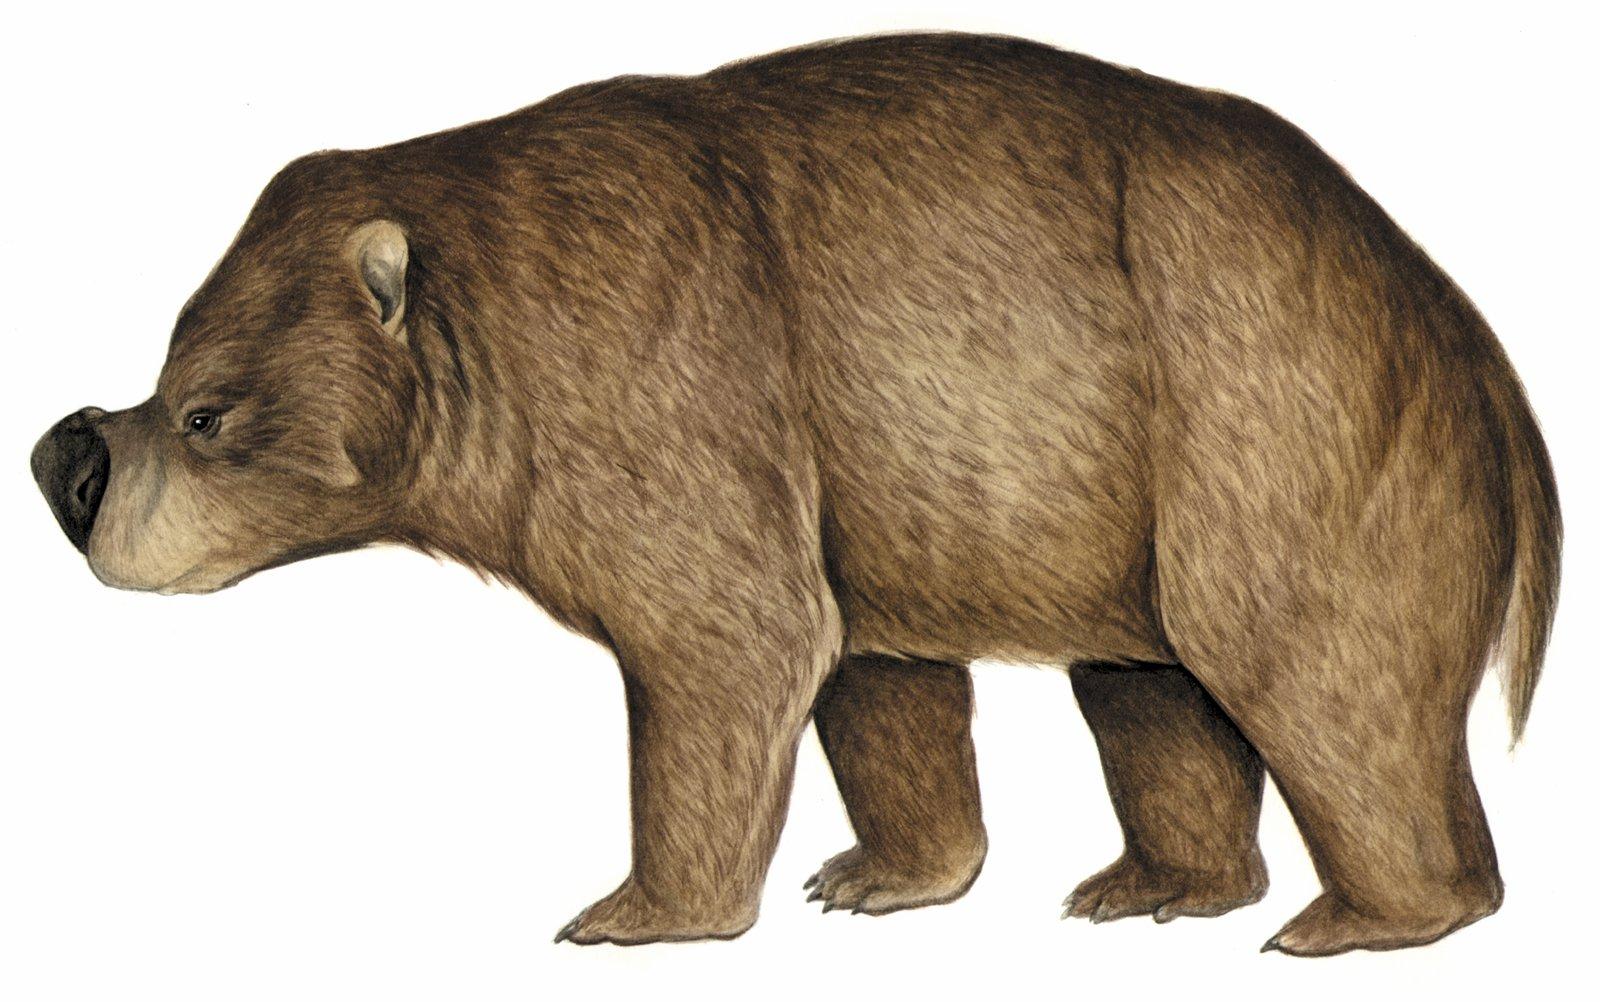 Zygomaturus